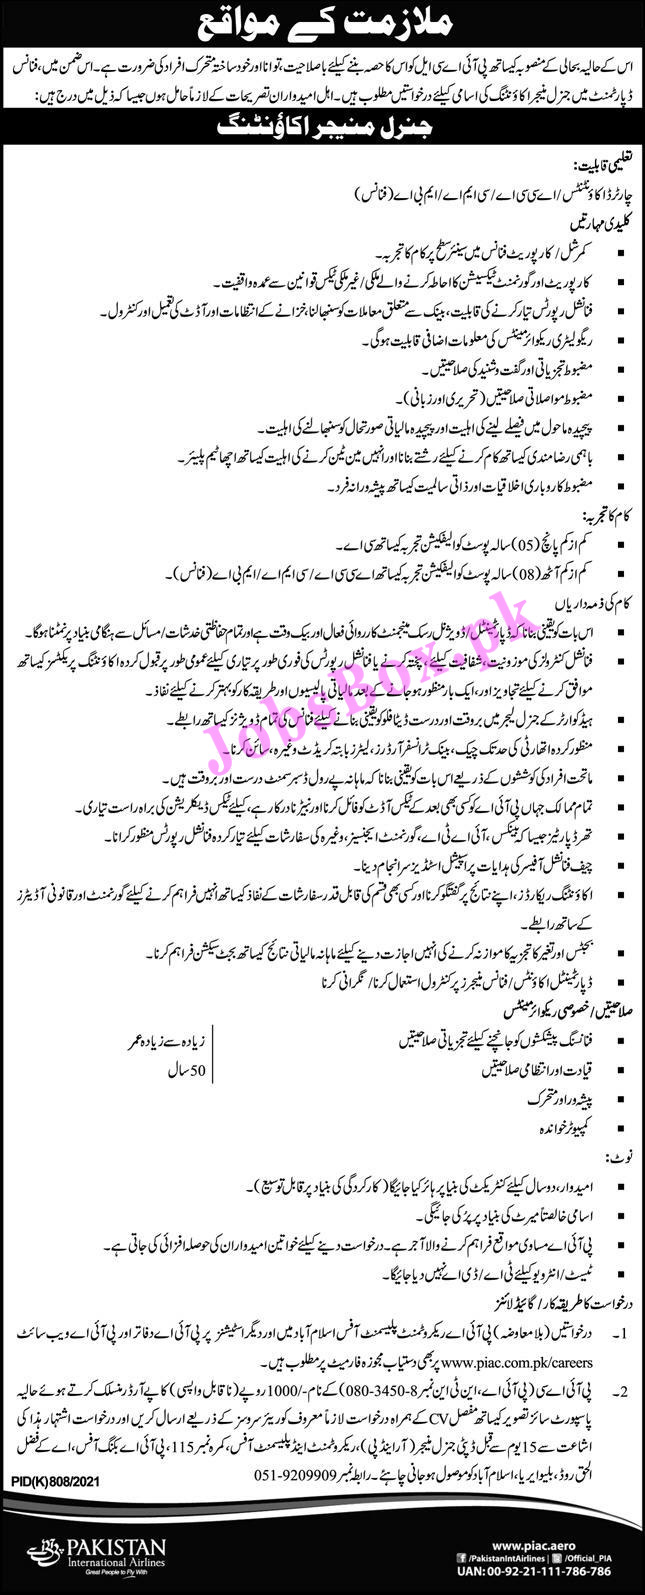 Pakistan International Airlines PIA Jobs 2021 – www.piac.com.pk/careers